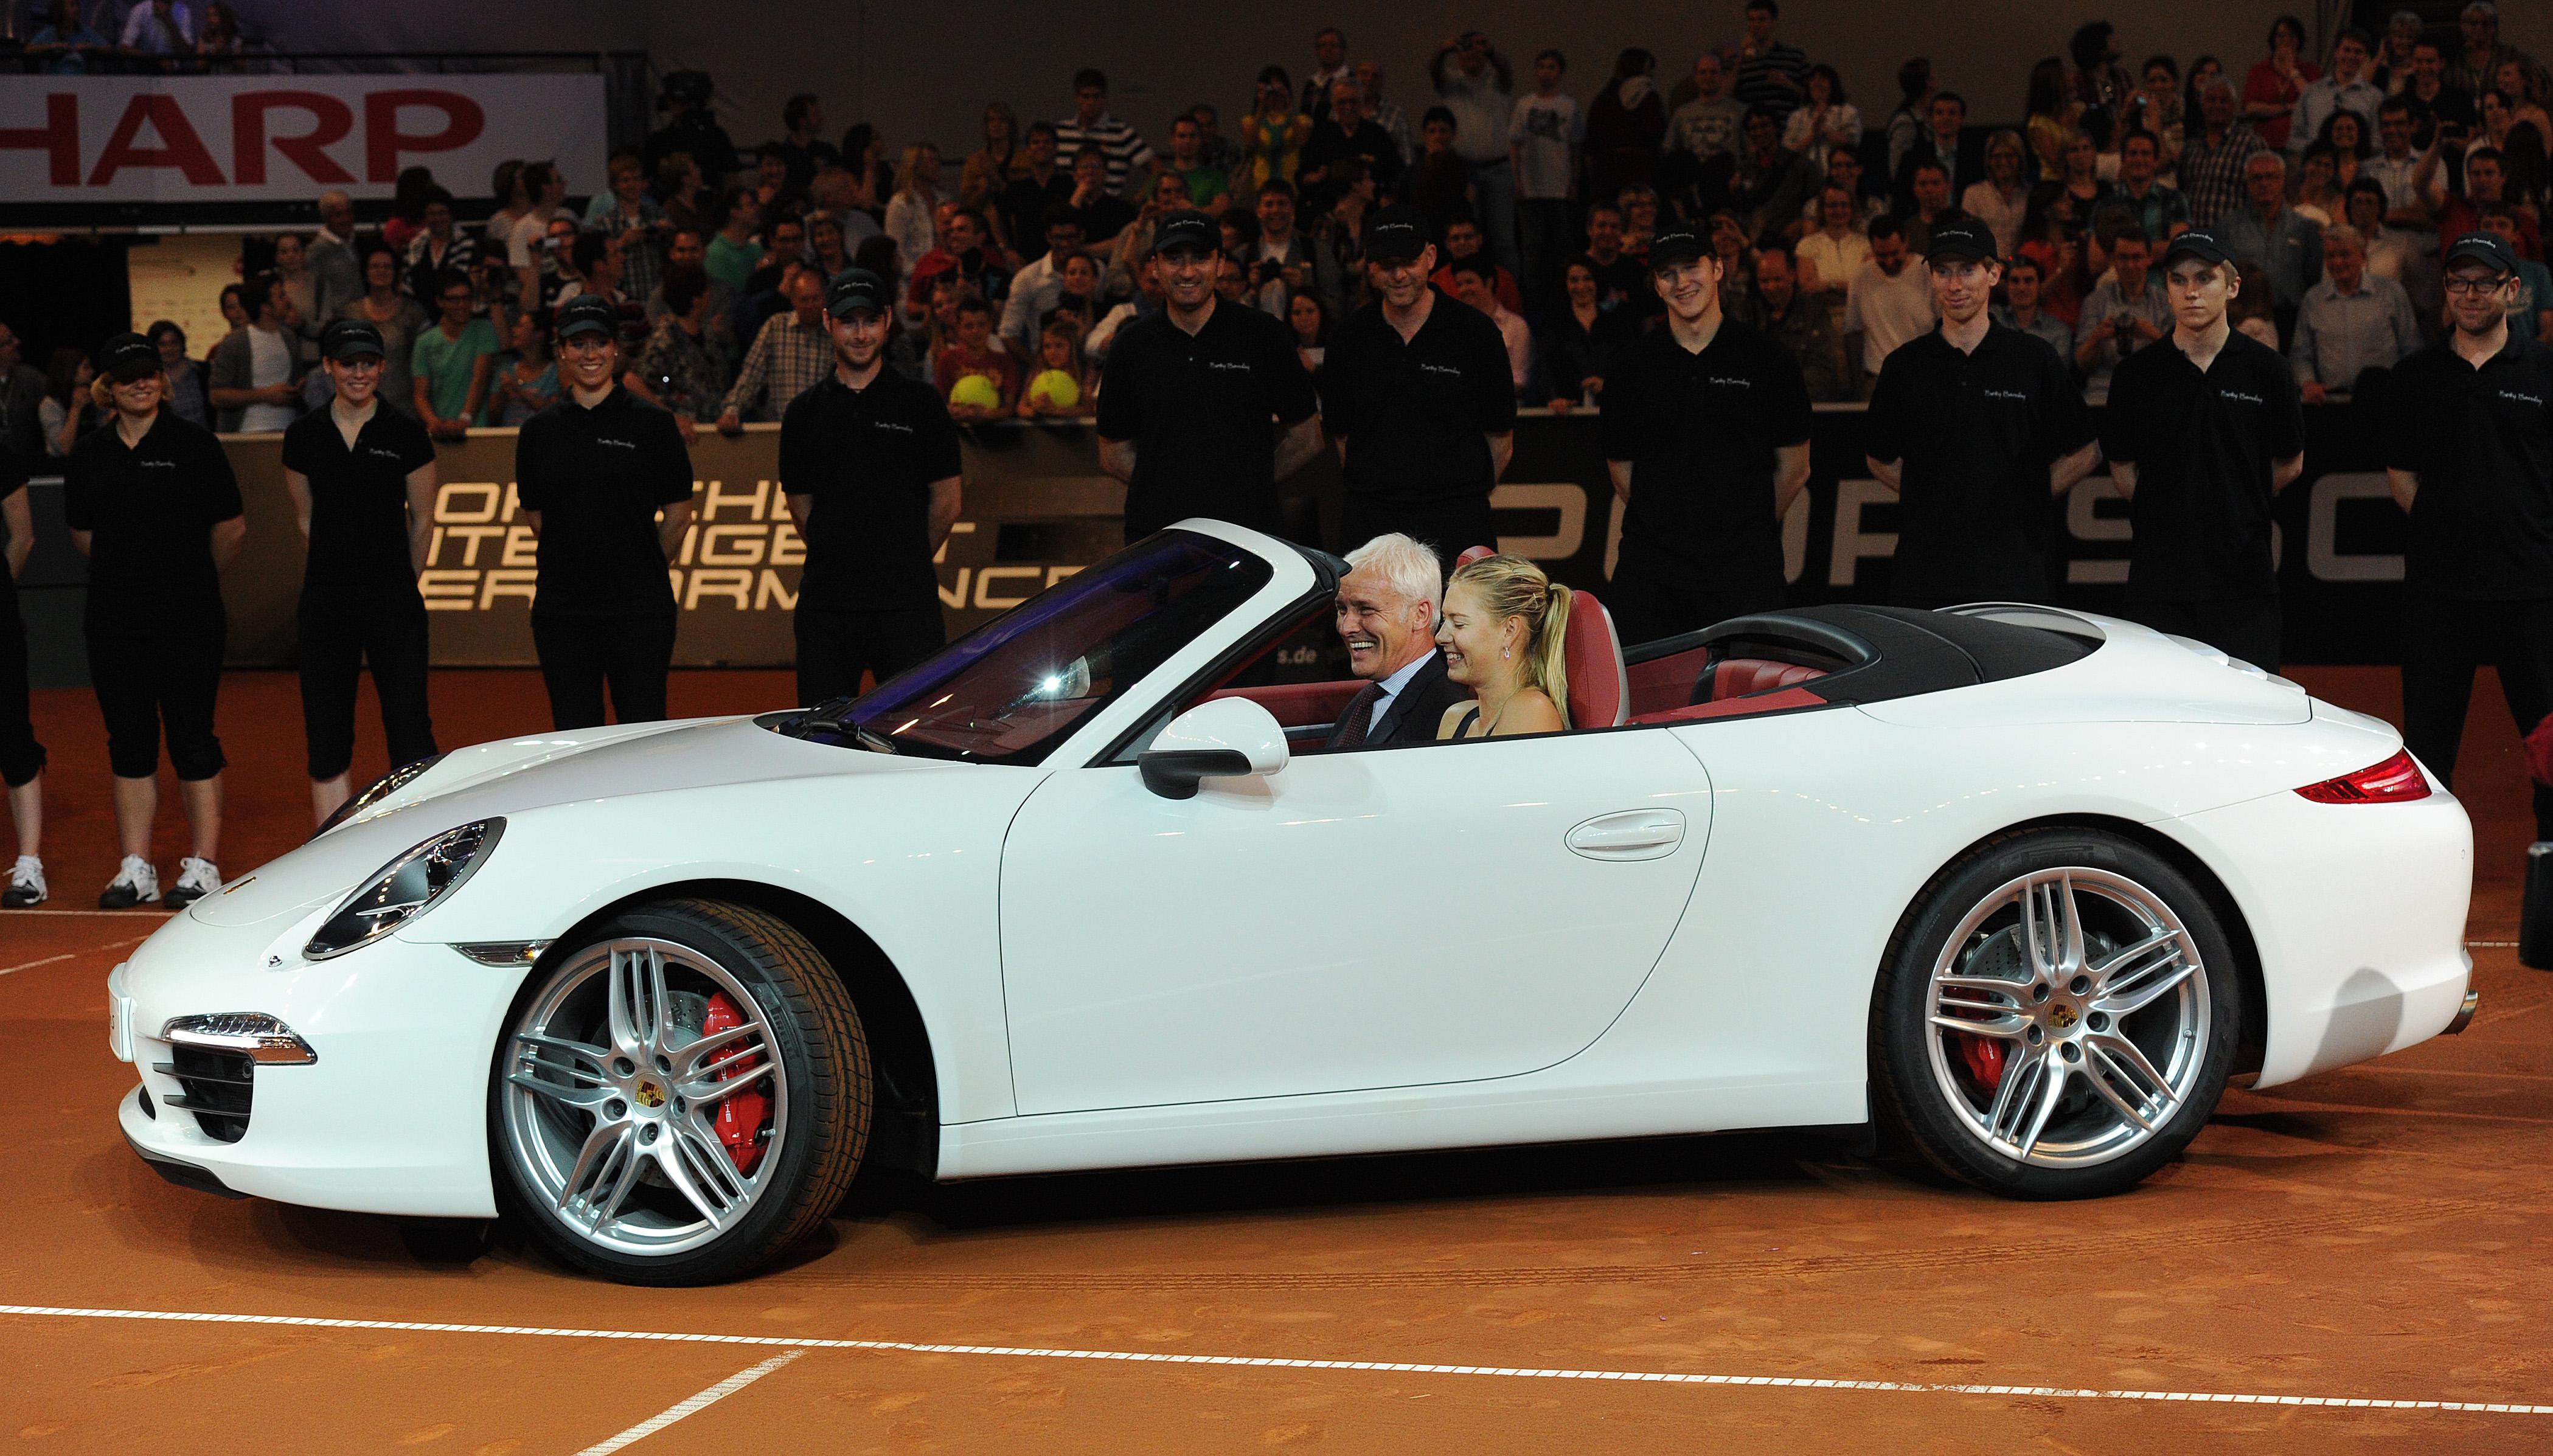 video tennis queen s great debut maria sharapova wins 2012 porsche tennis grand prix porsche. Black Bedroom Furniture Sets. Home Design Ideas